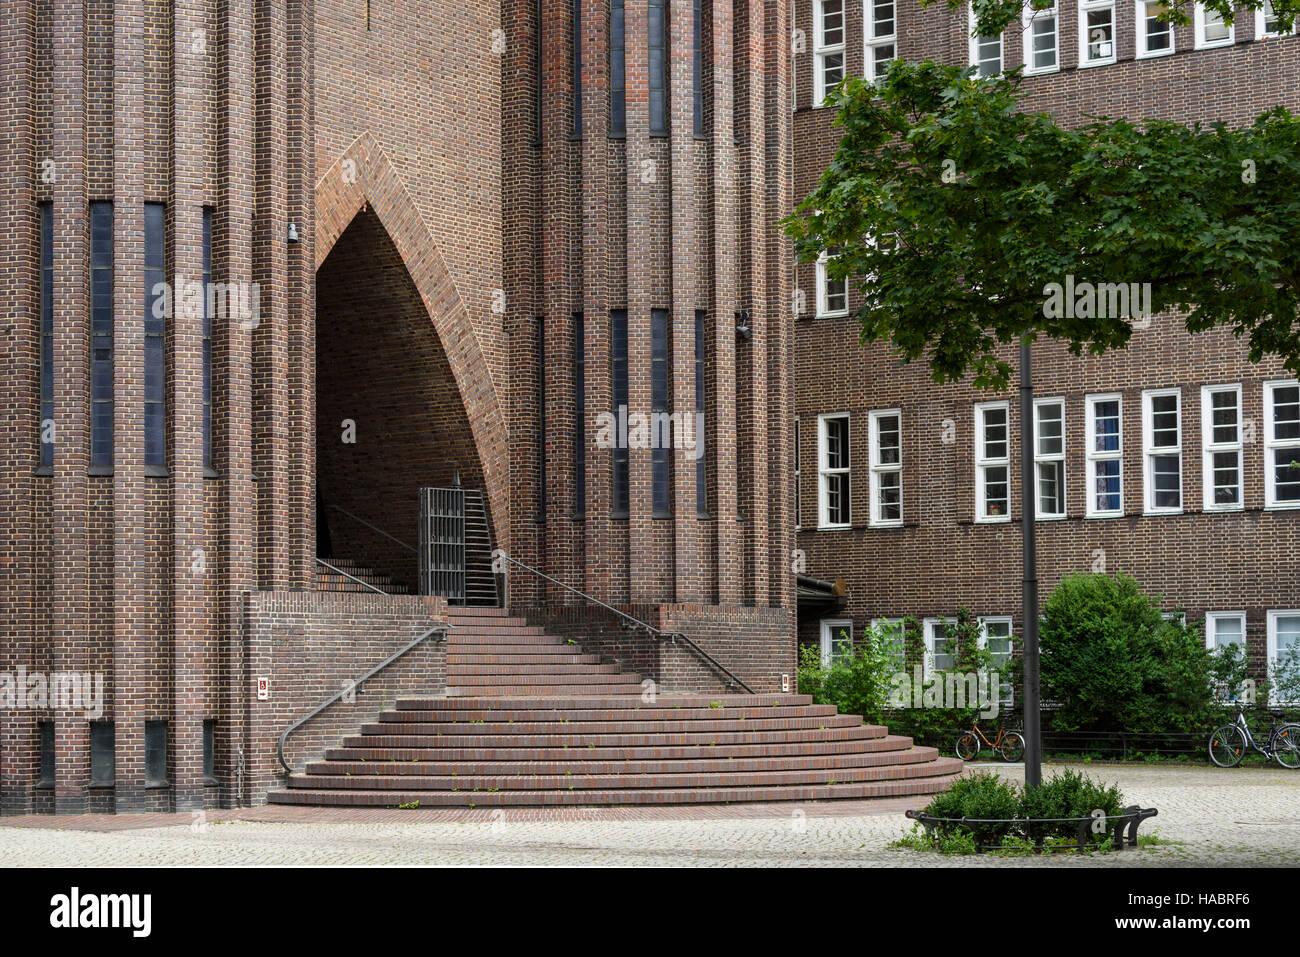 Berlin. Germany. Kirche Am Hohenzollernplatz. Built 1930-1933 to a design by Fritz Höger. - Stock Image